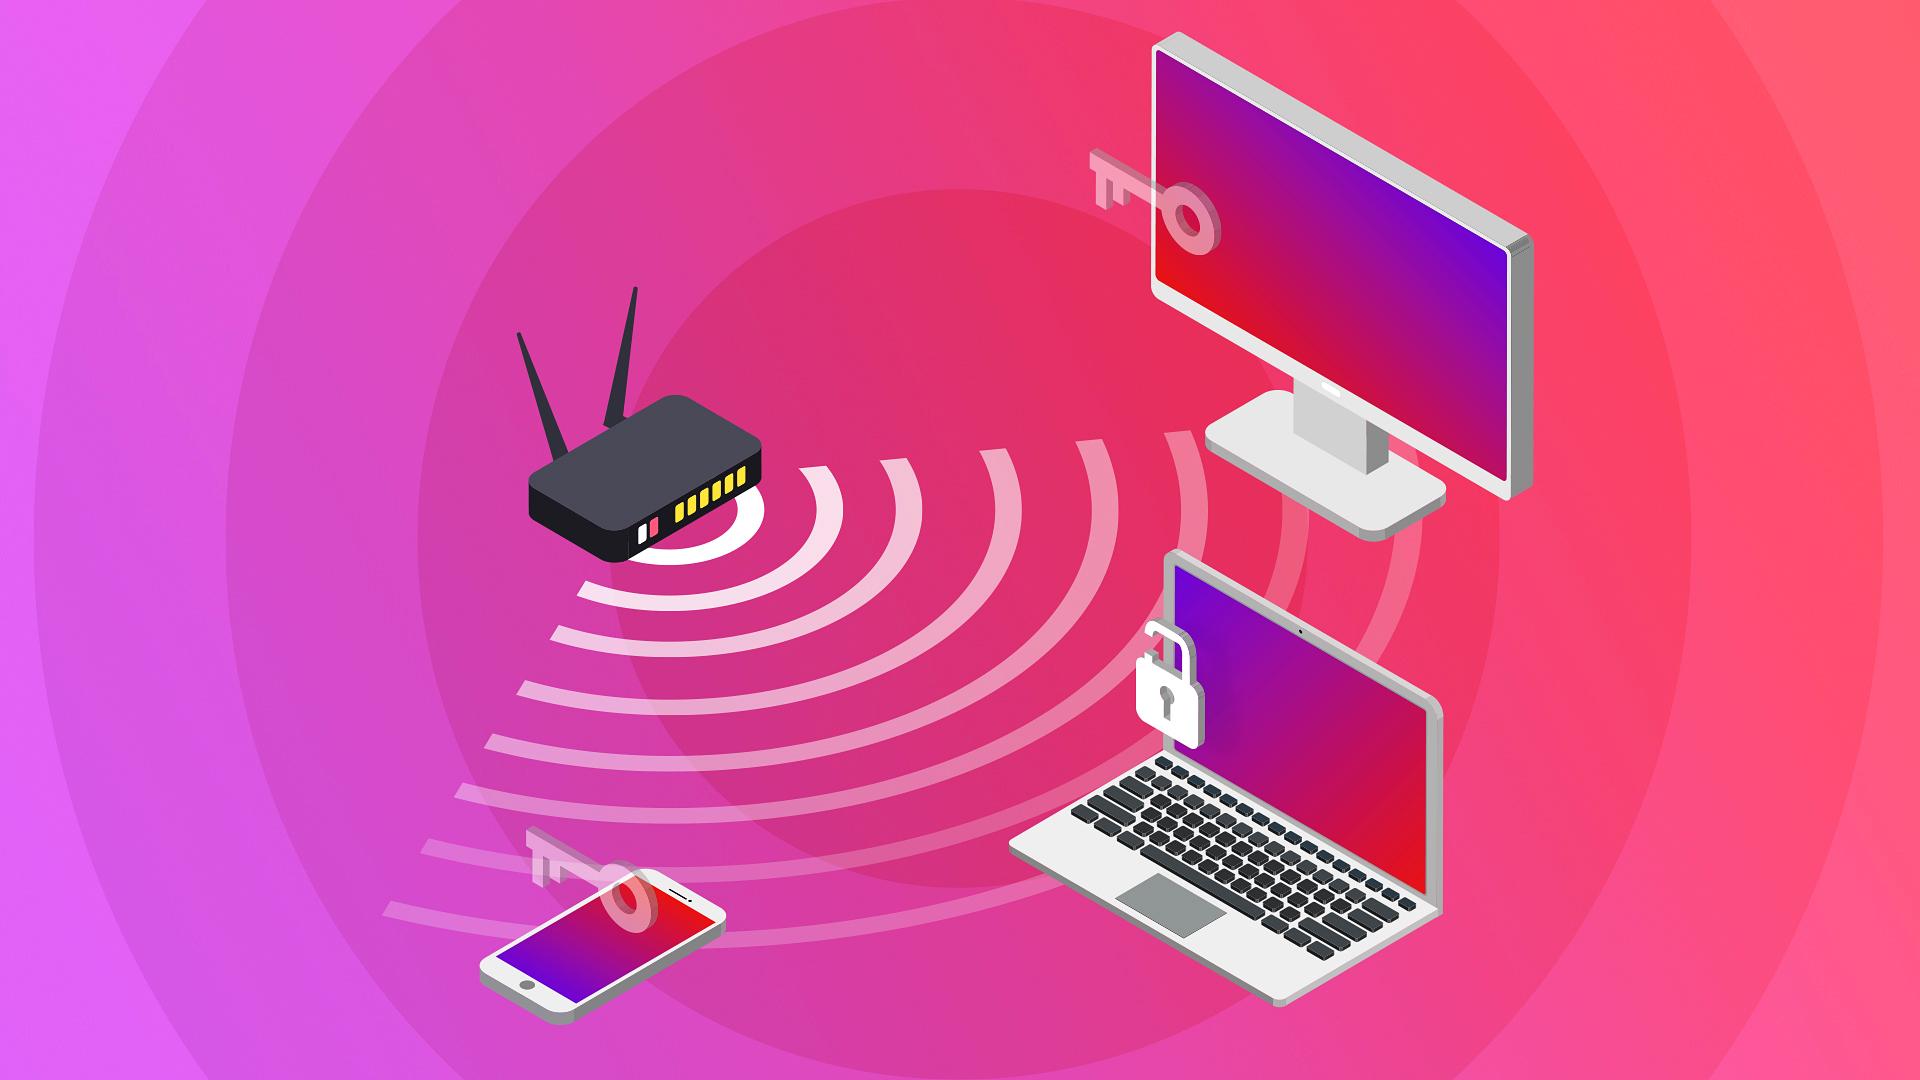 Вебинар Методы защиты WiFi сетей фото